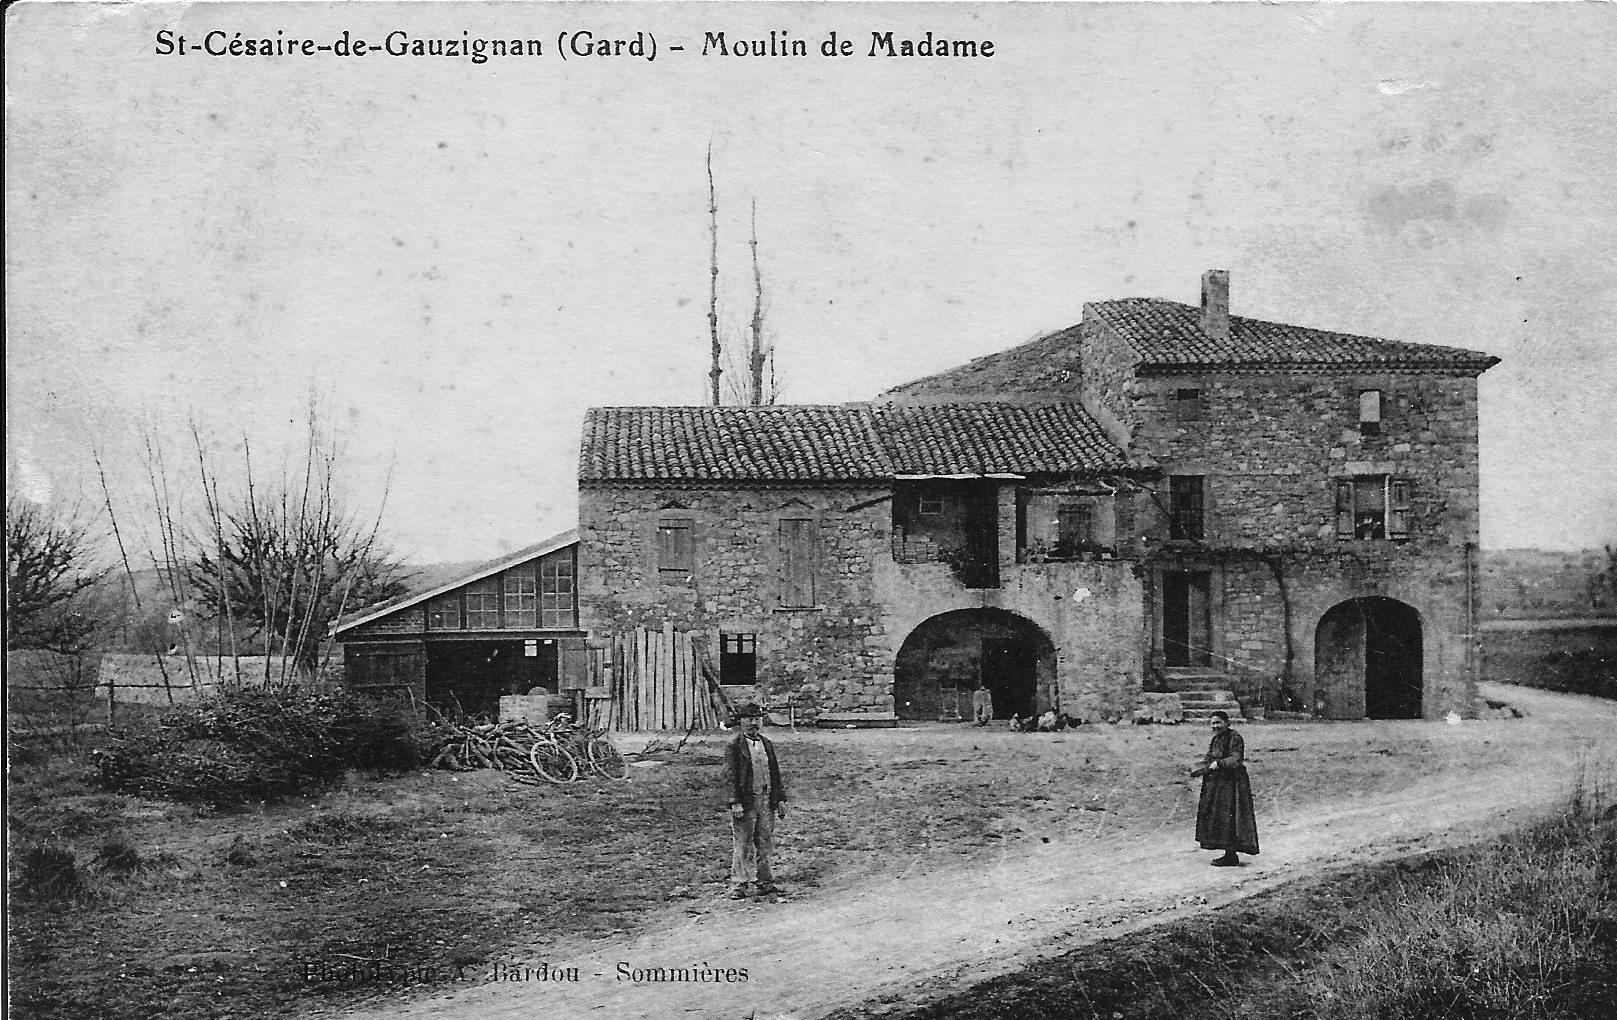 12 le moulin de madame.jpg